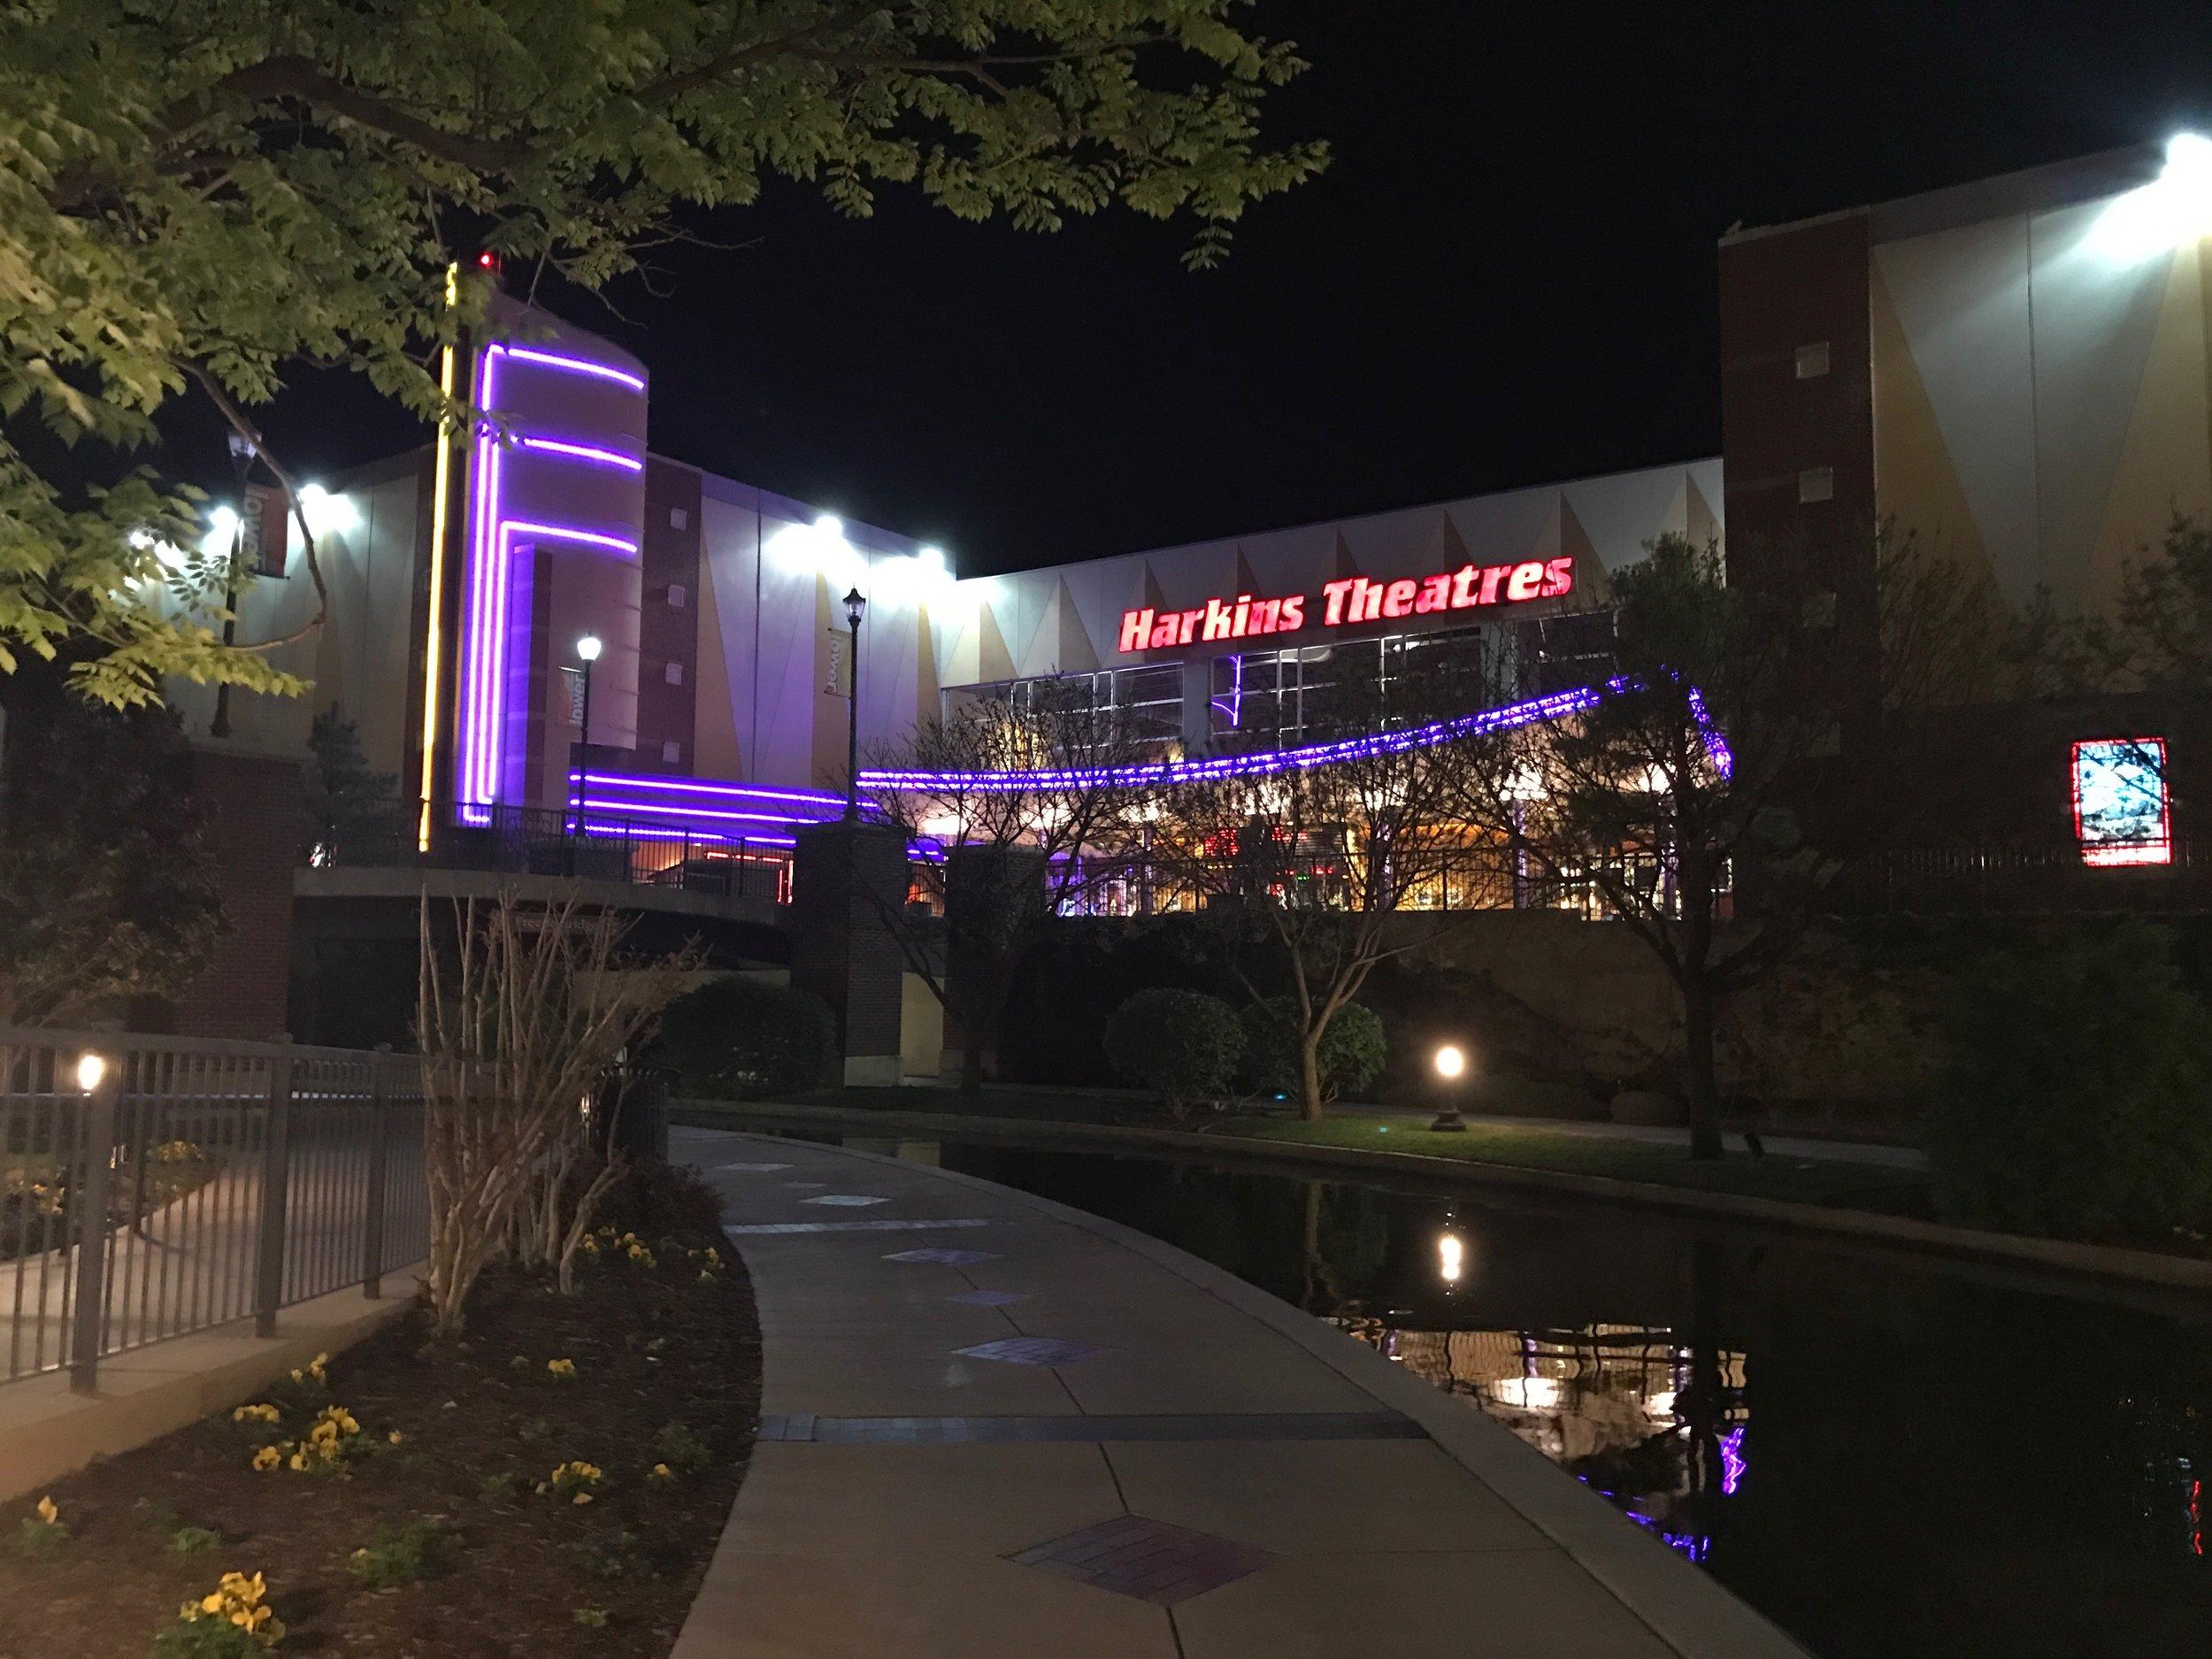 Harkins Theaters Bricktown 16